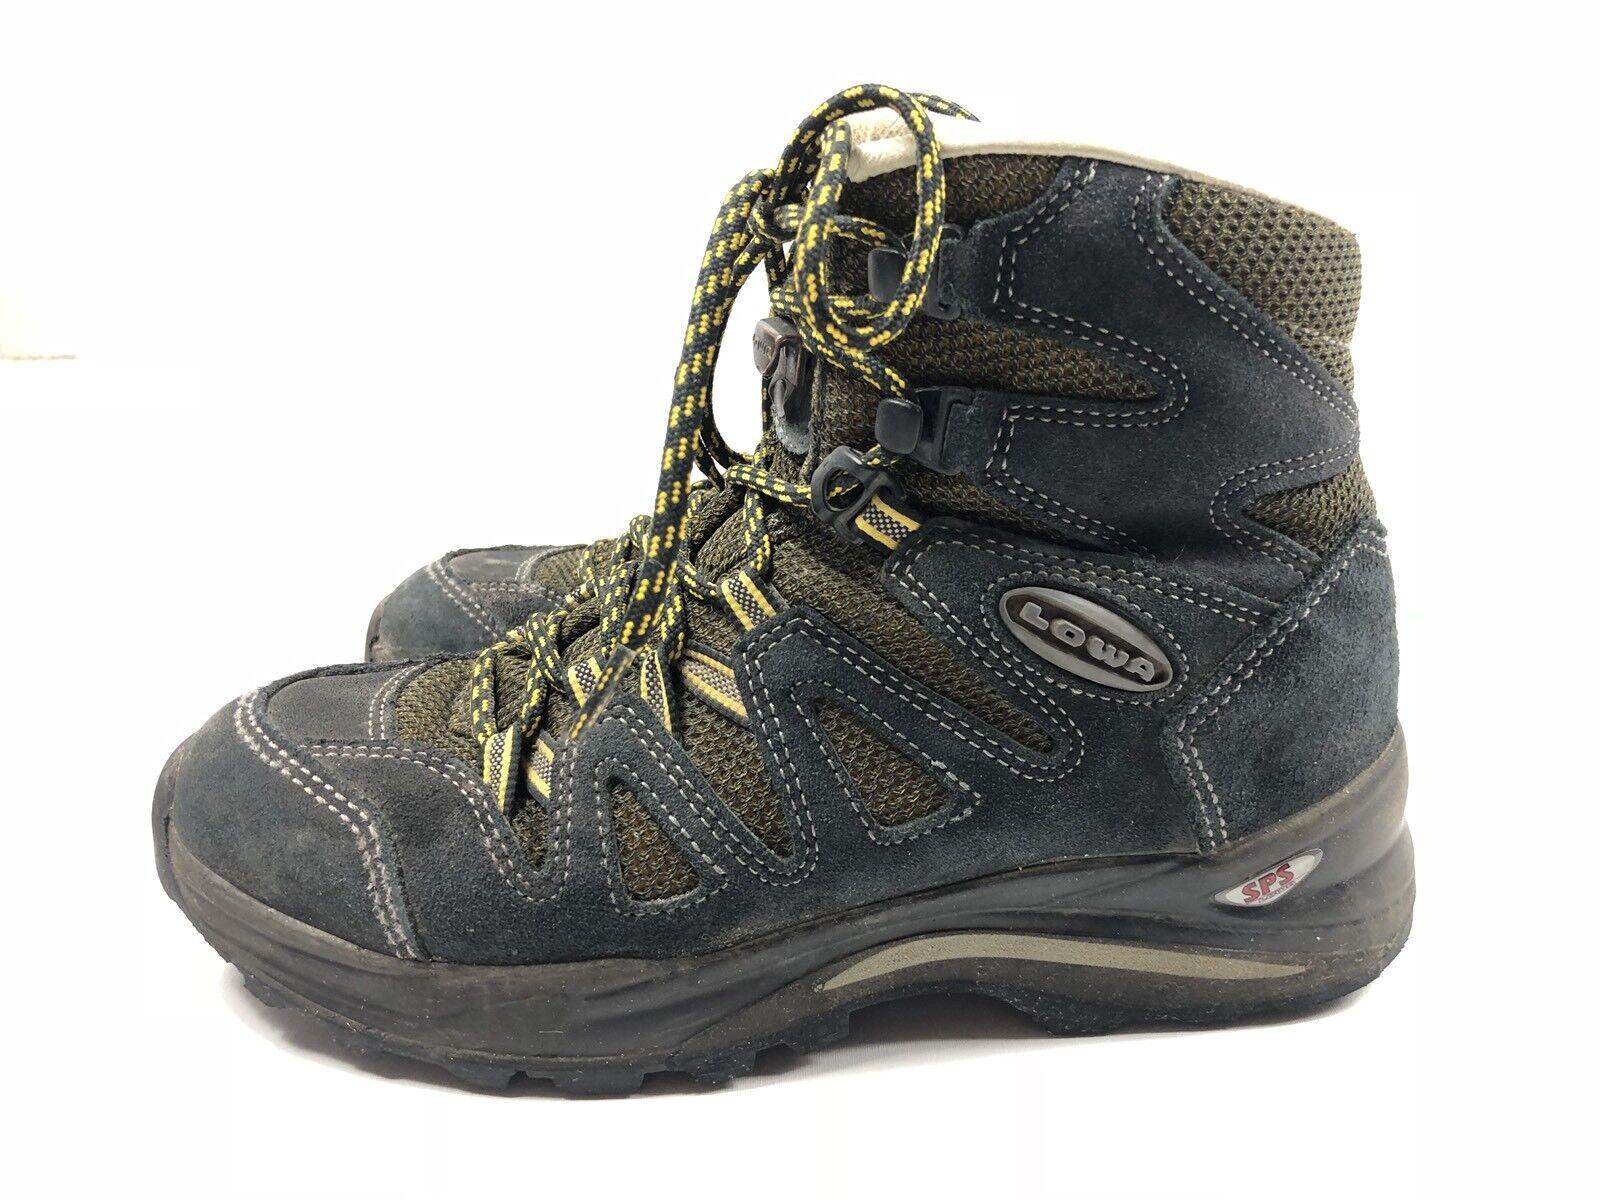 Lowa Women's Jannu Mid Vibram Trekking Hiking Boots bluee Size 6